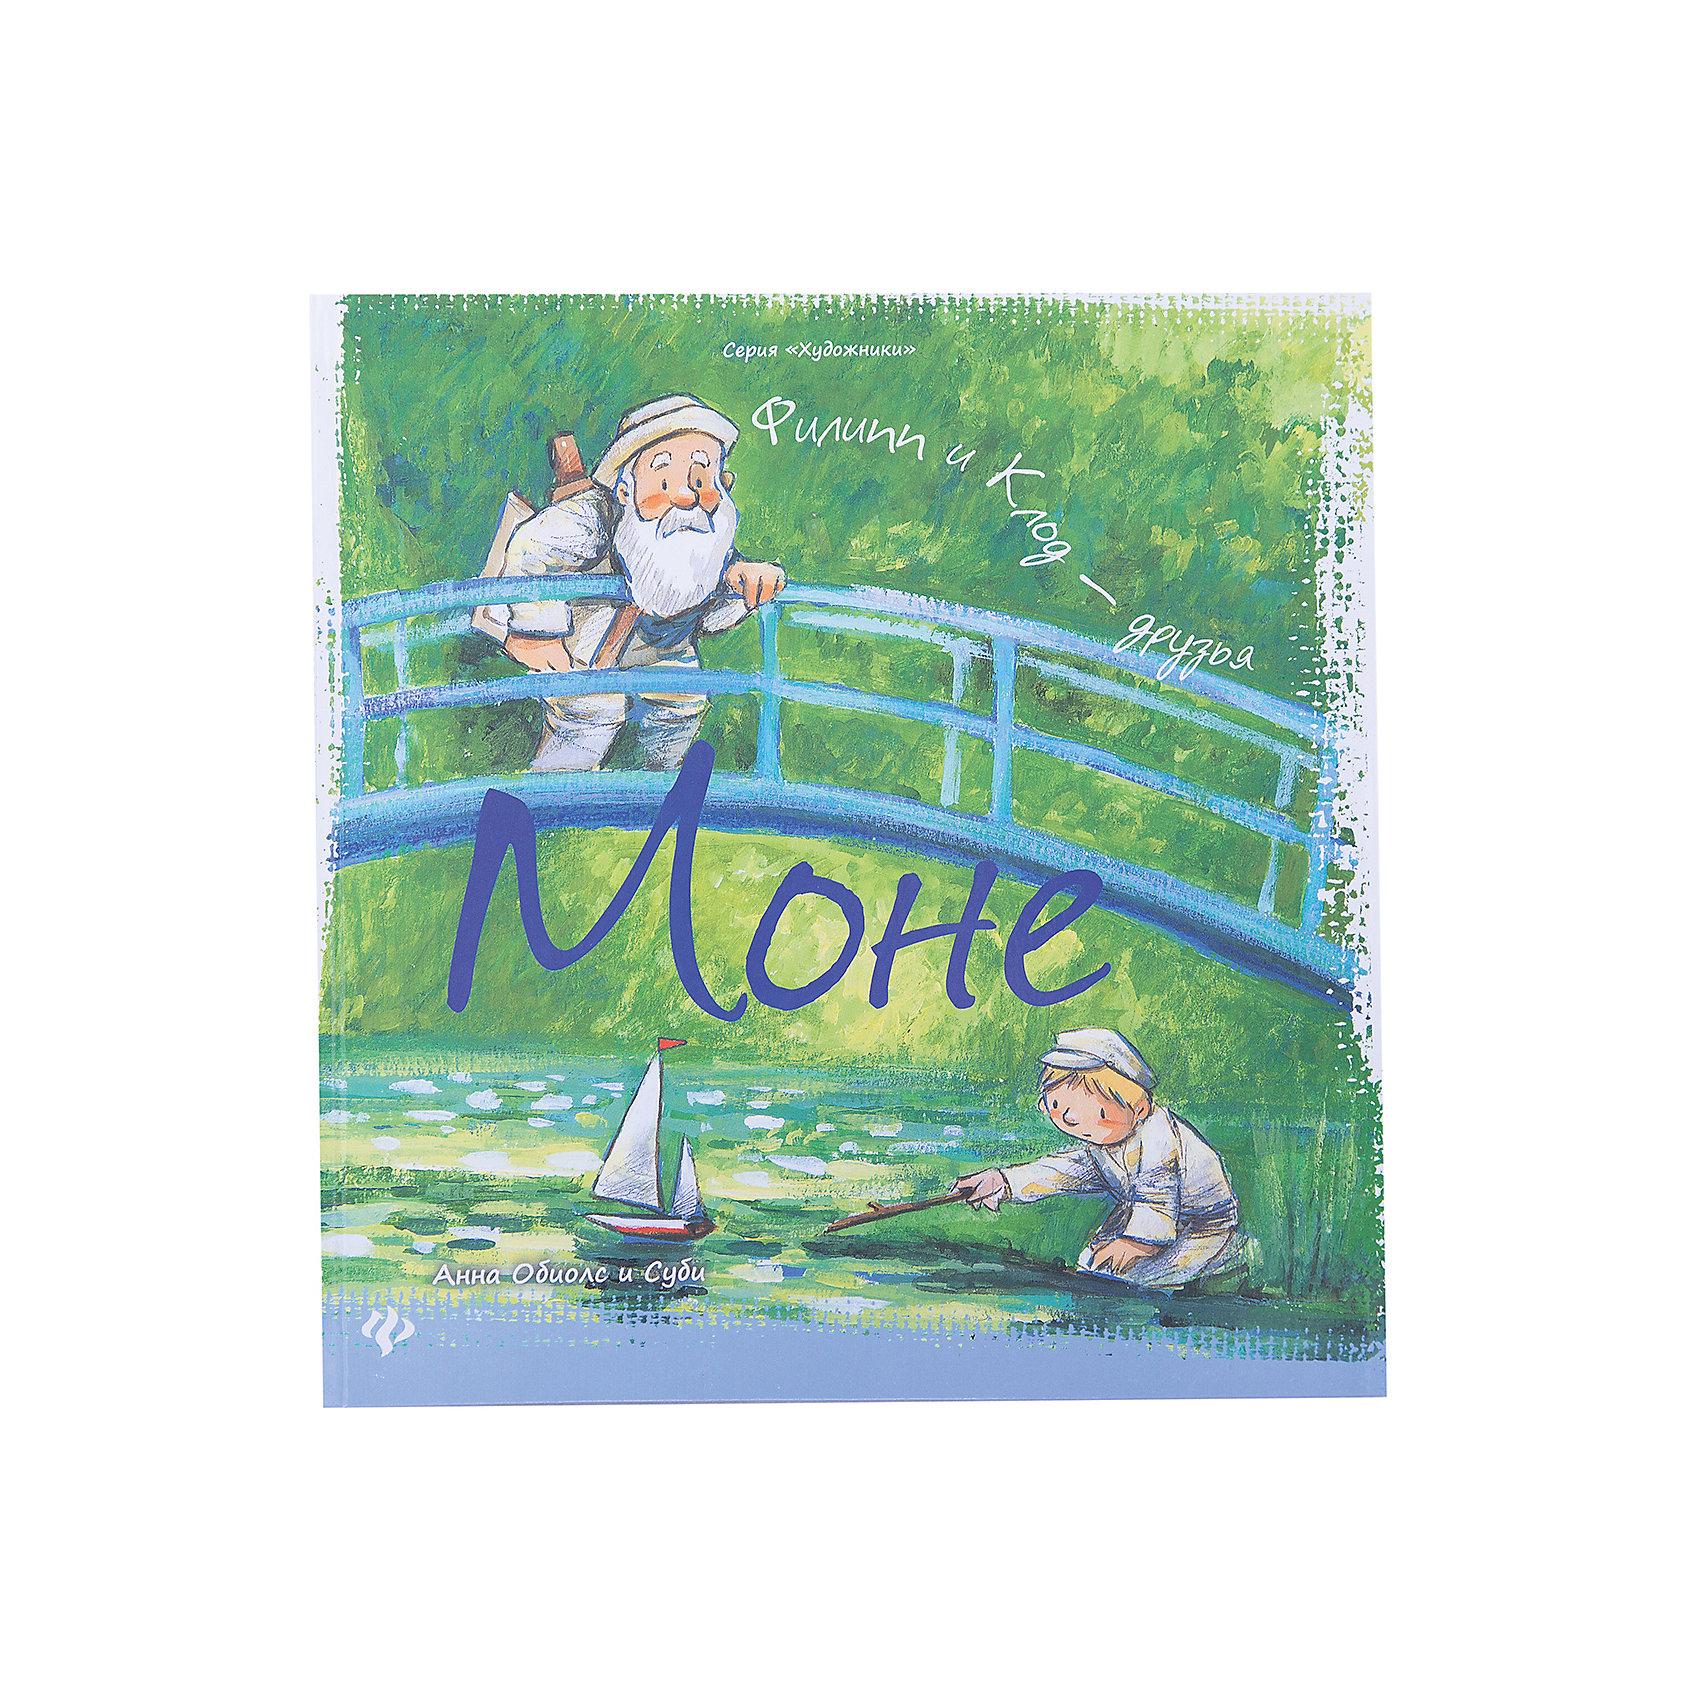 Fenix Моне: Филипп и Клод - друзья, 2-е издание филипп пестрак встретимся на баррикадах